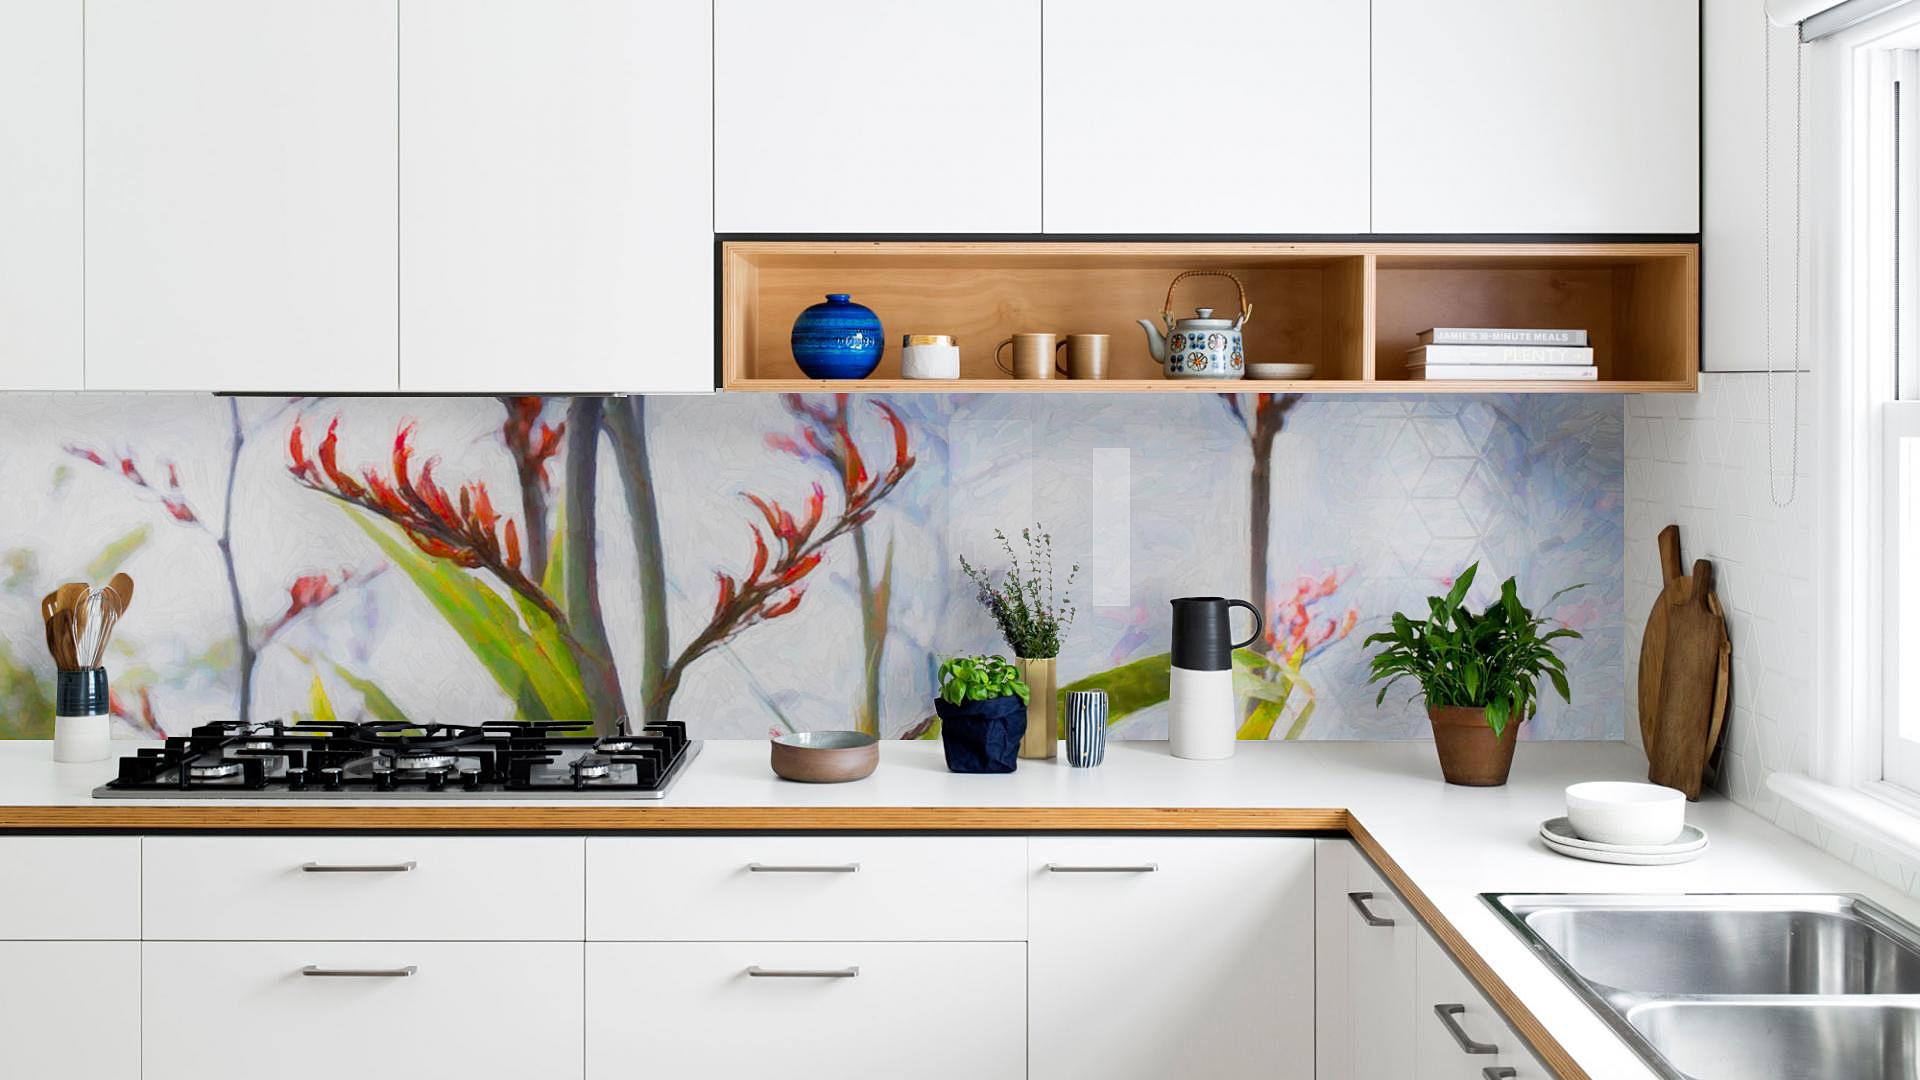 'FLAX FLOWER 1' (digital painting) printed image on glass splashback